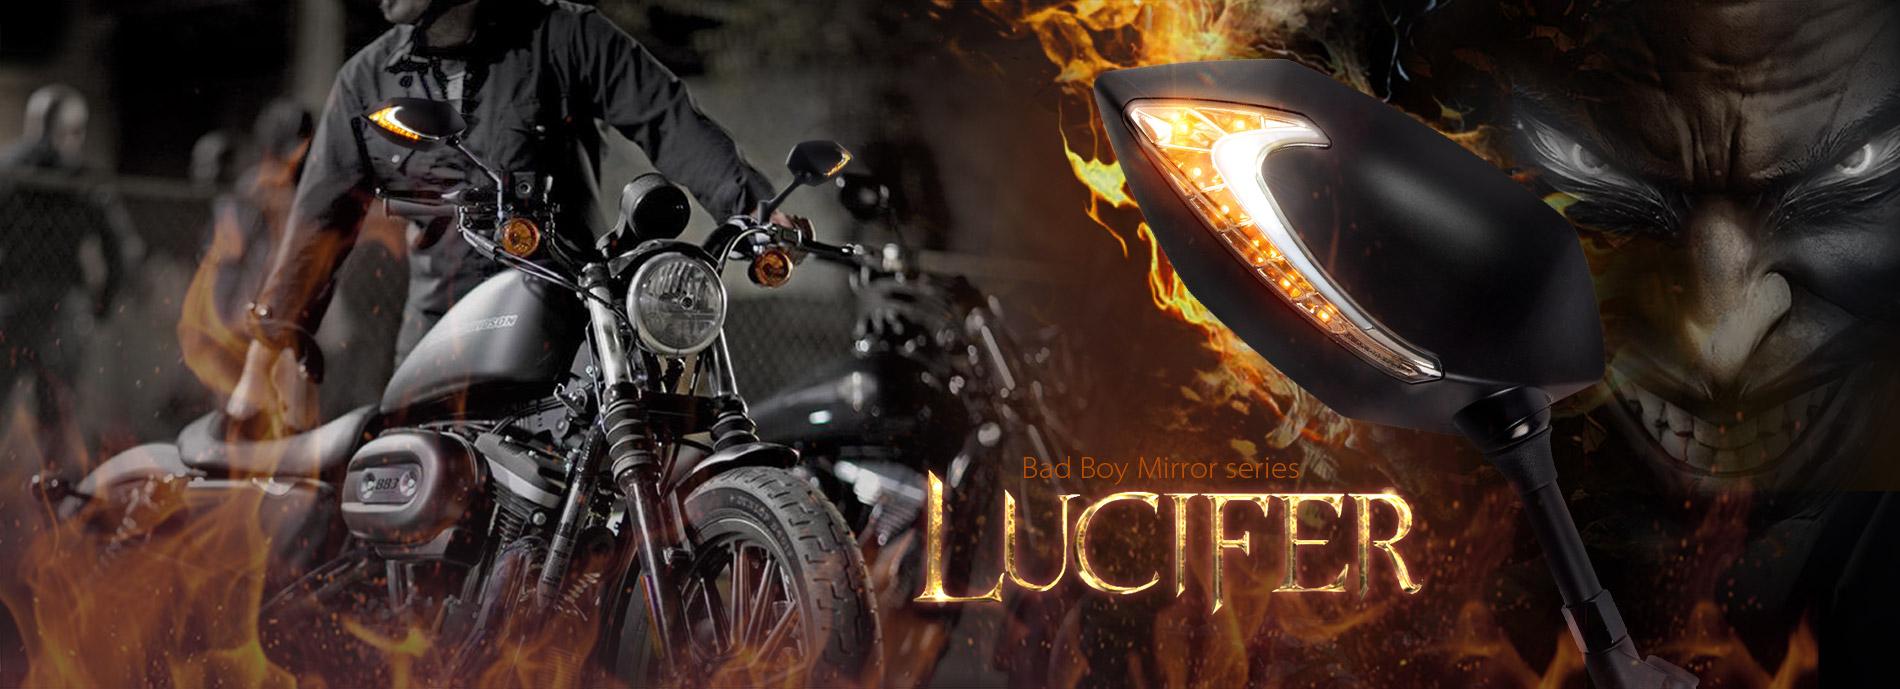 slide-ad-LuciferLED